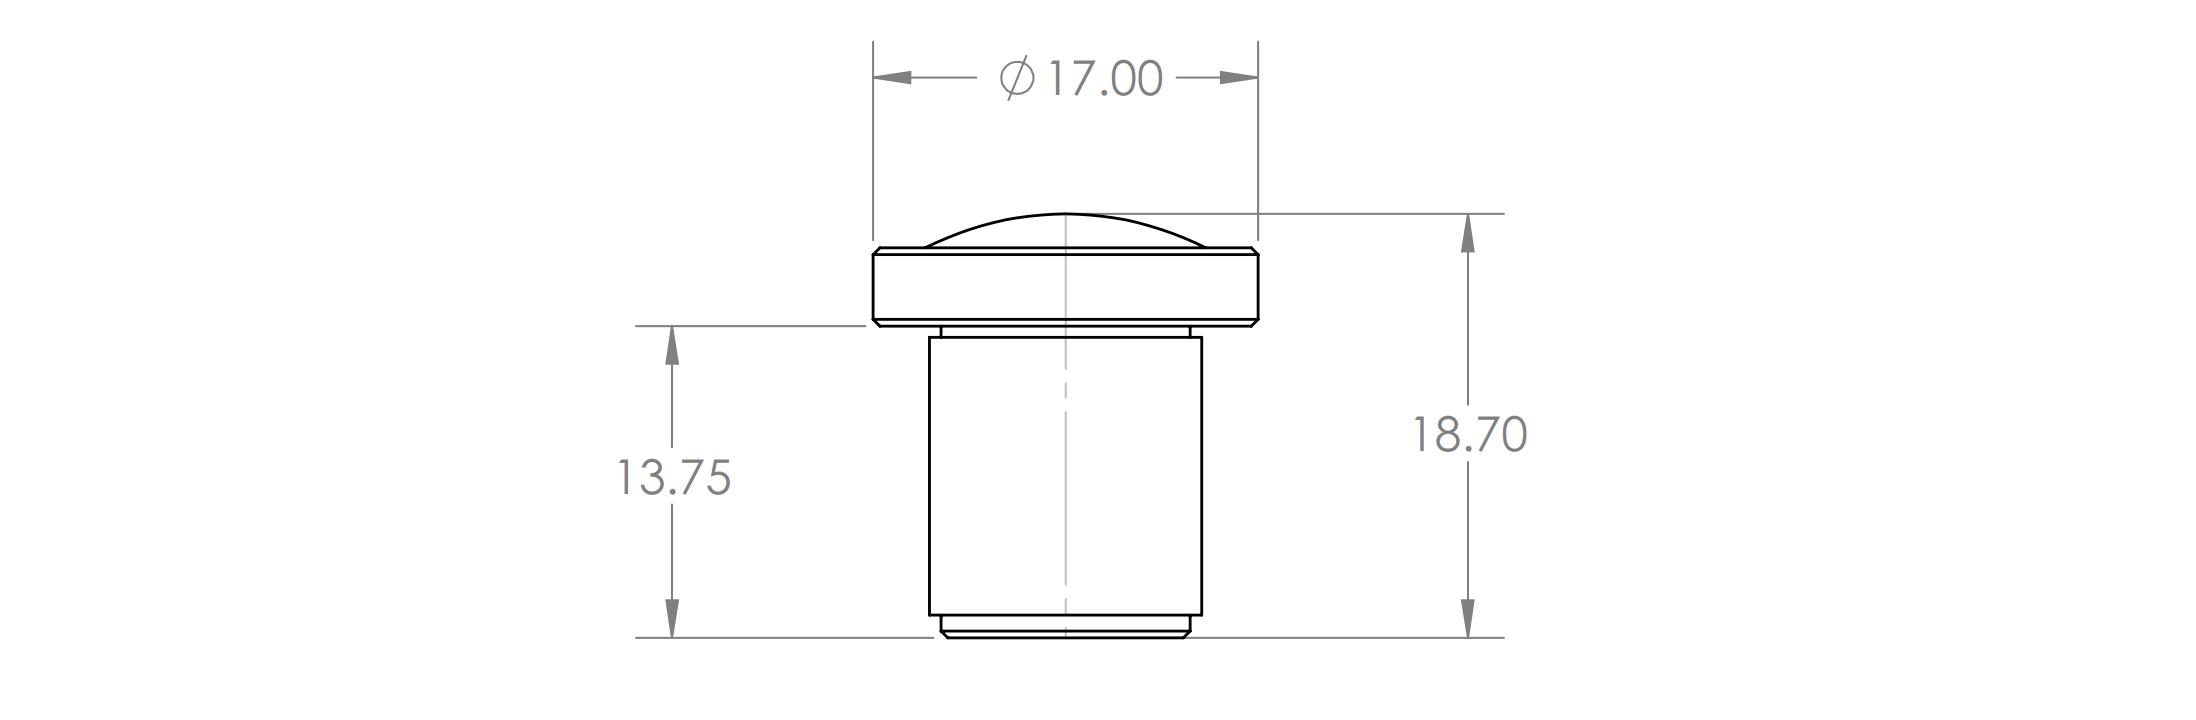 L064-2_1-M12_dimensions.png